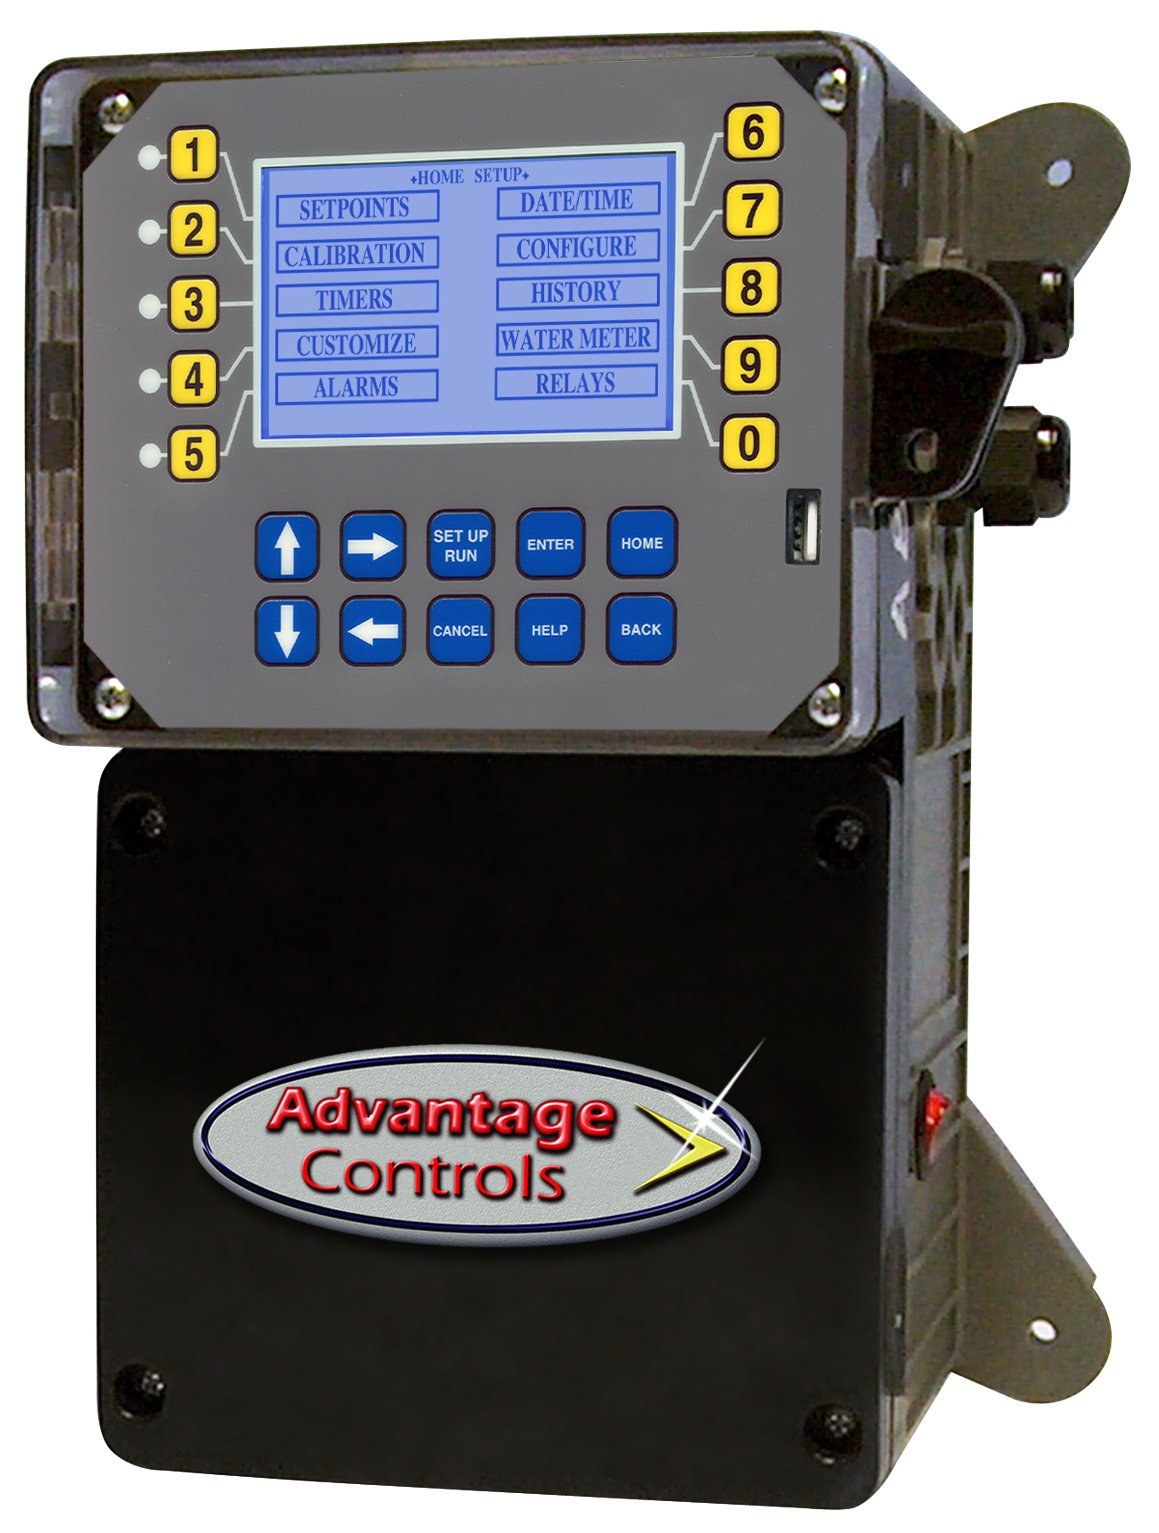 Advantage MegaTron XS Controller